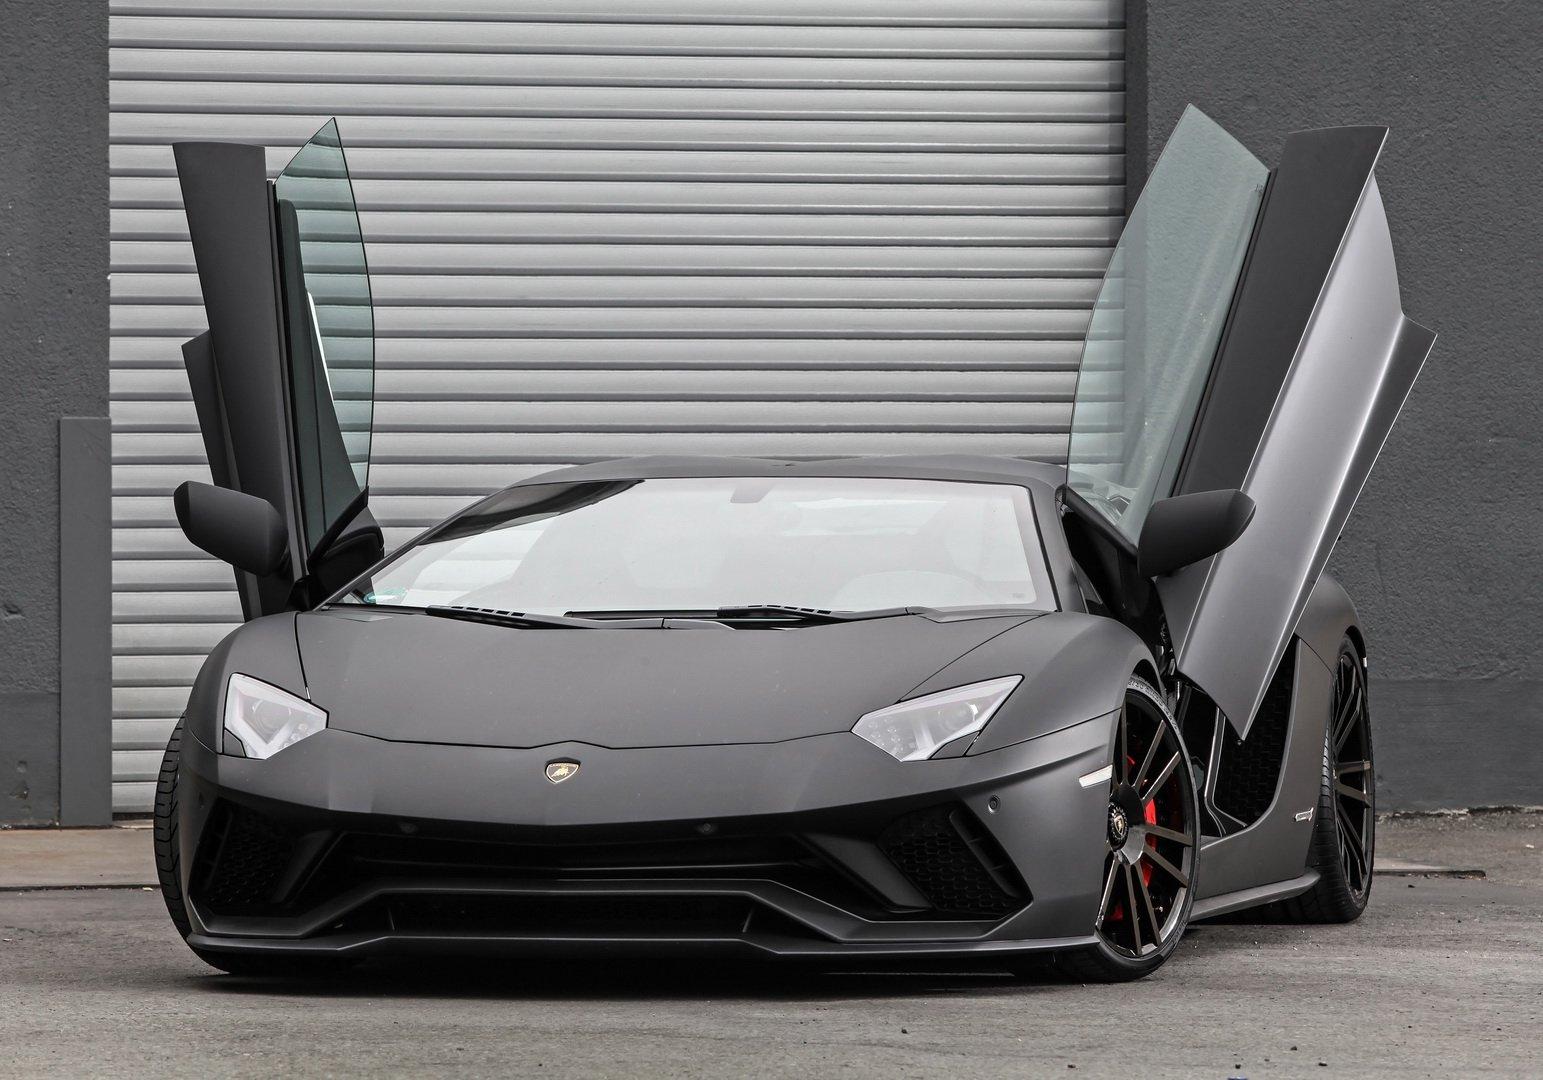 Lamborghini Aventador S Roadster by Wheelsandmore (17)